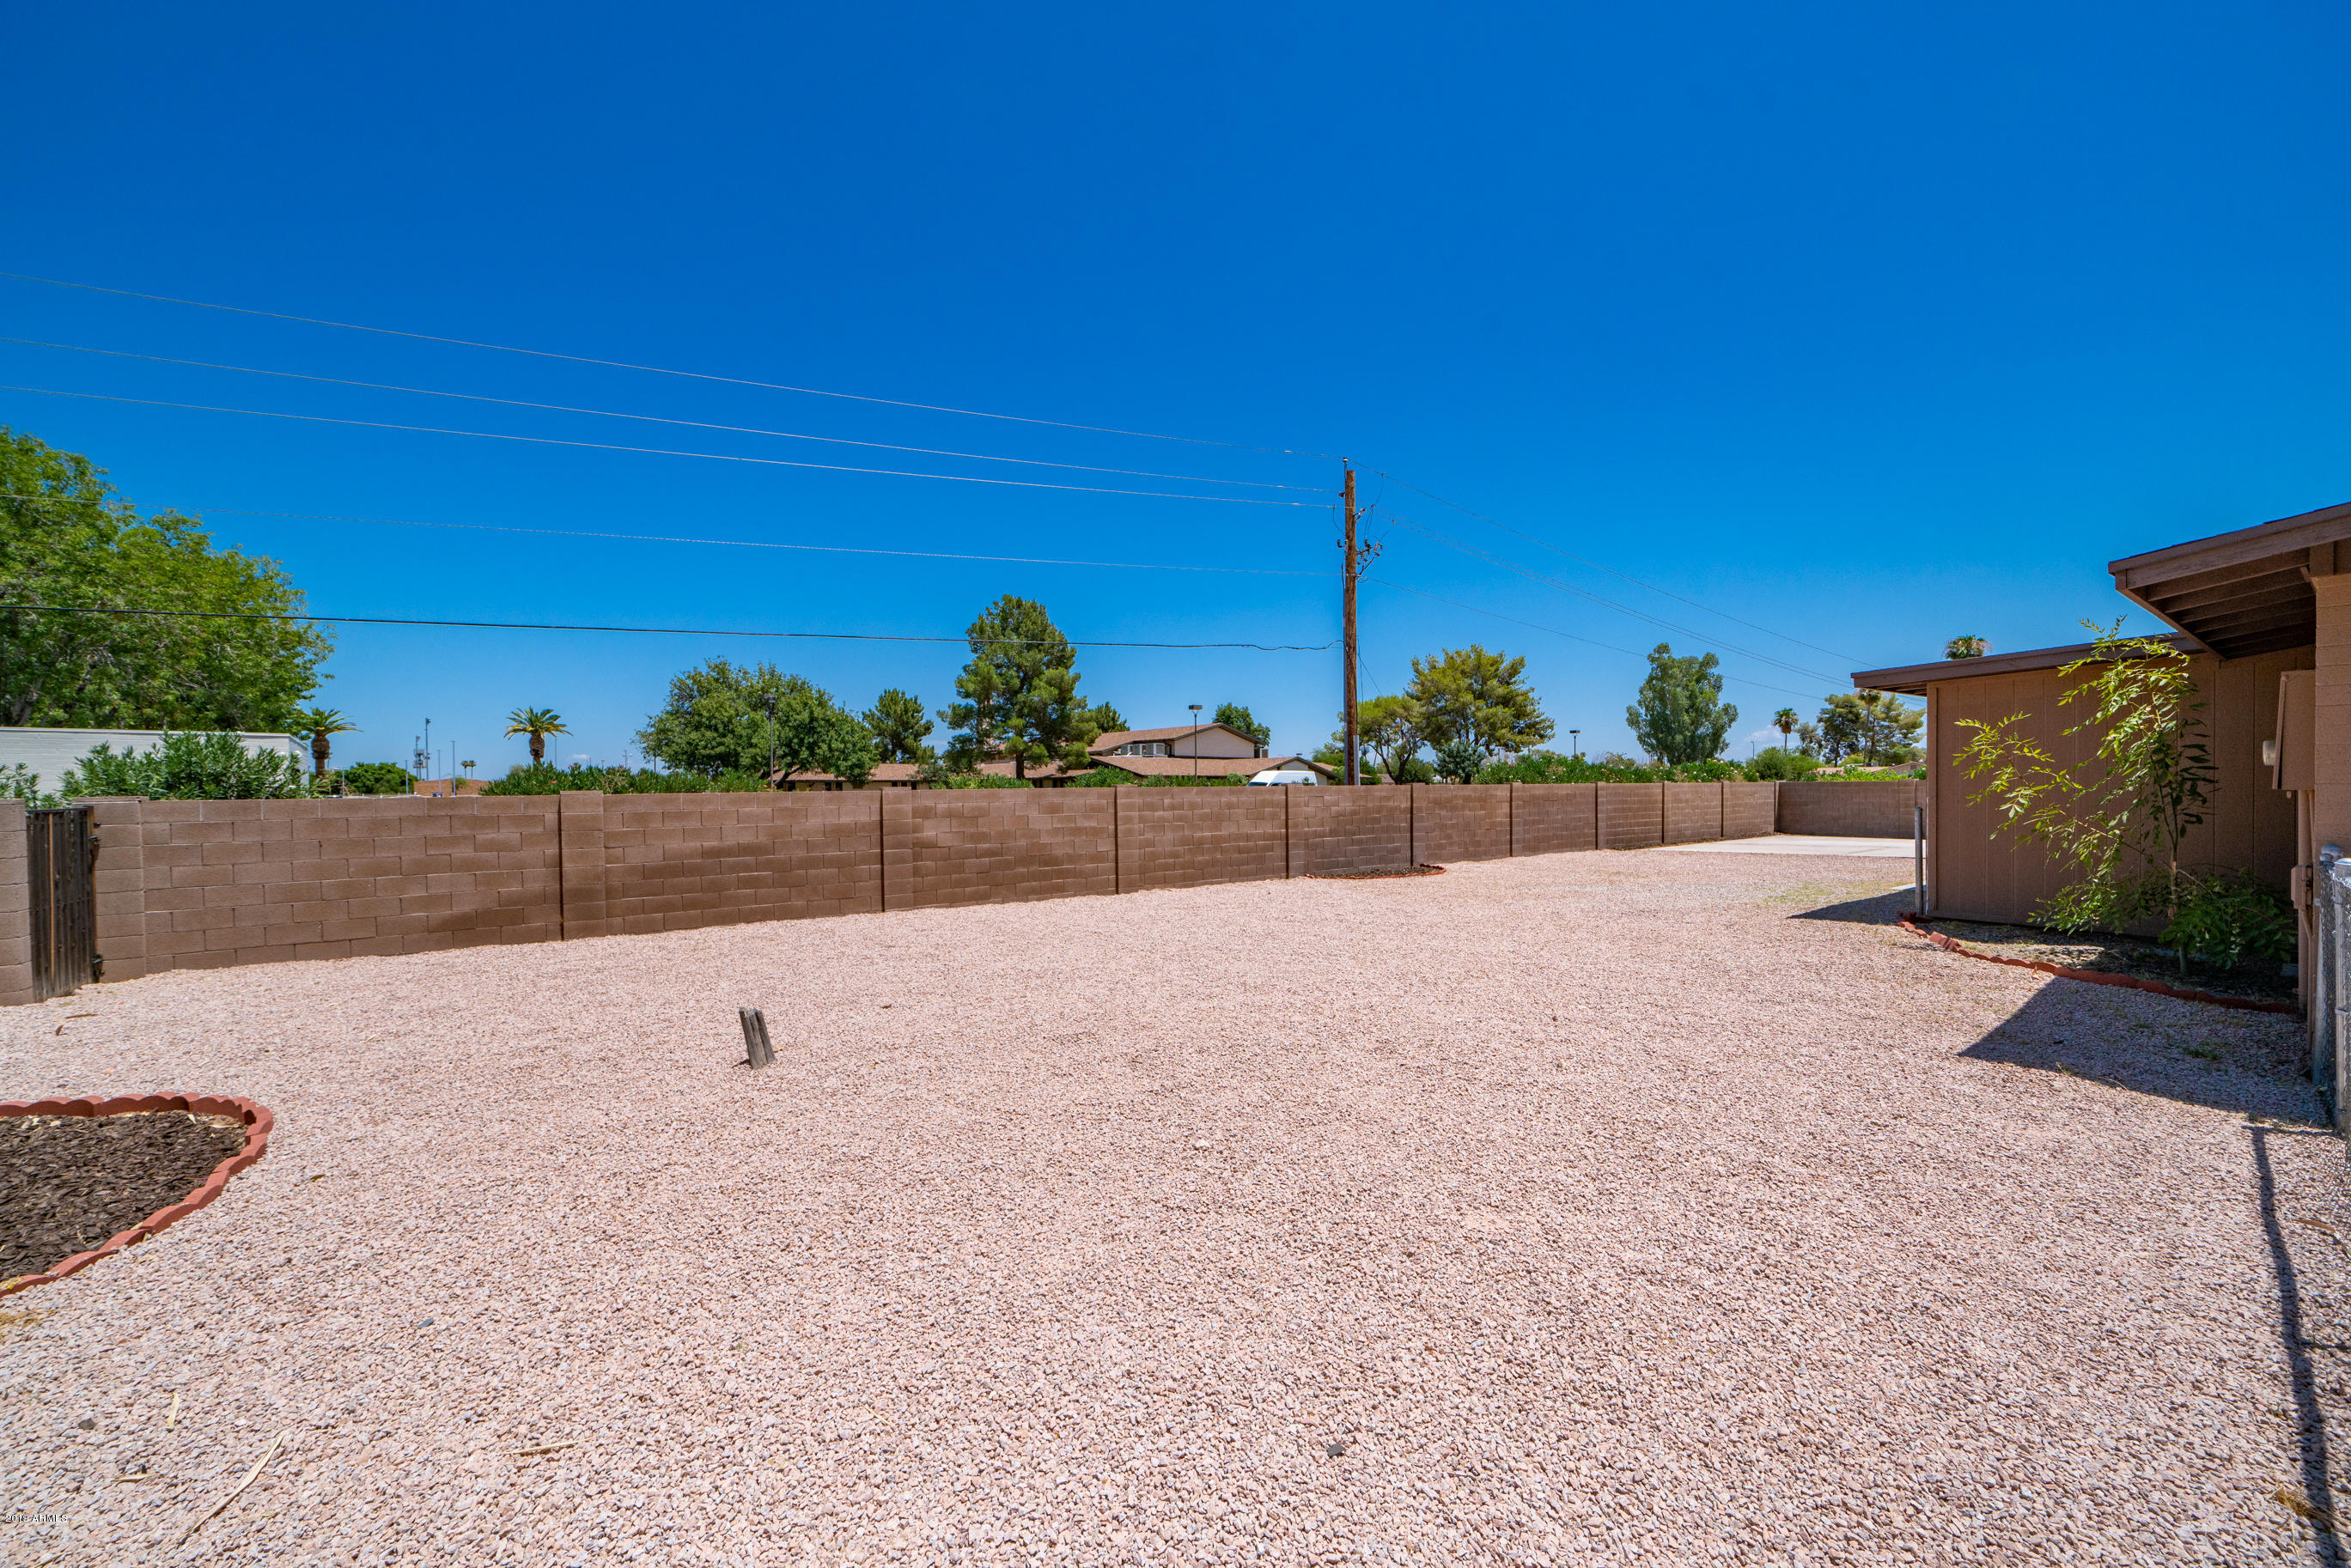 MLS 5953534 3100 S TAYLOR Drive, Tempe, AZ 85282 Tempe AZ Knoell Tempe